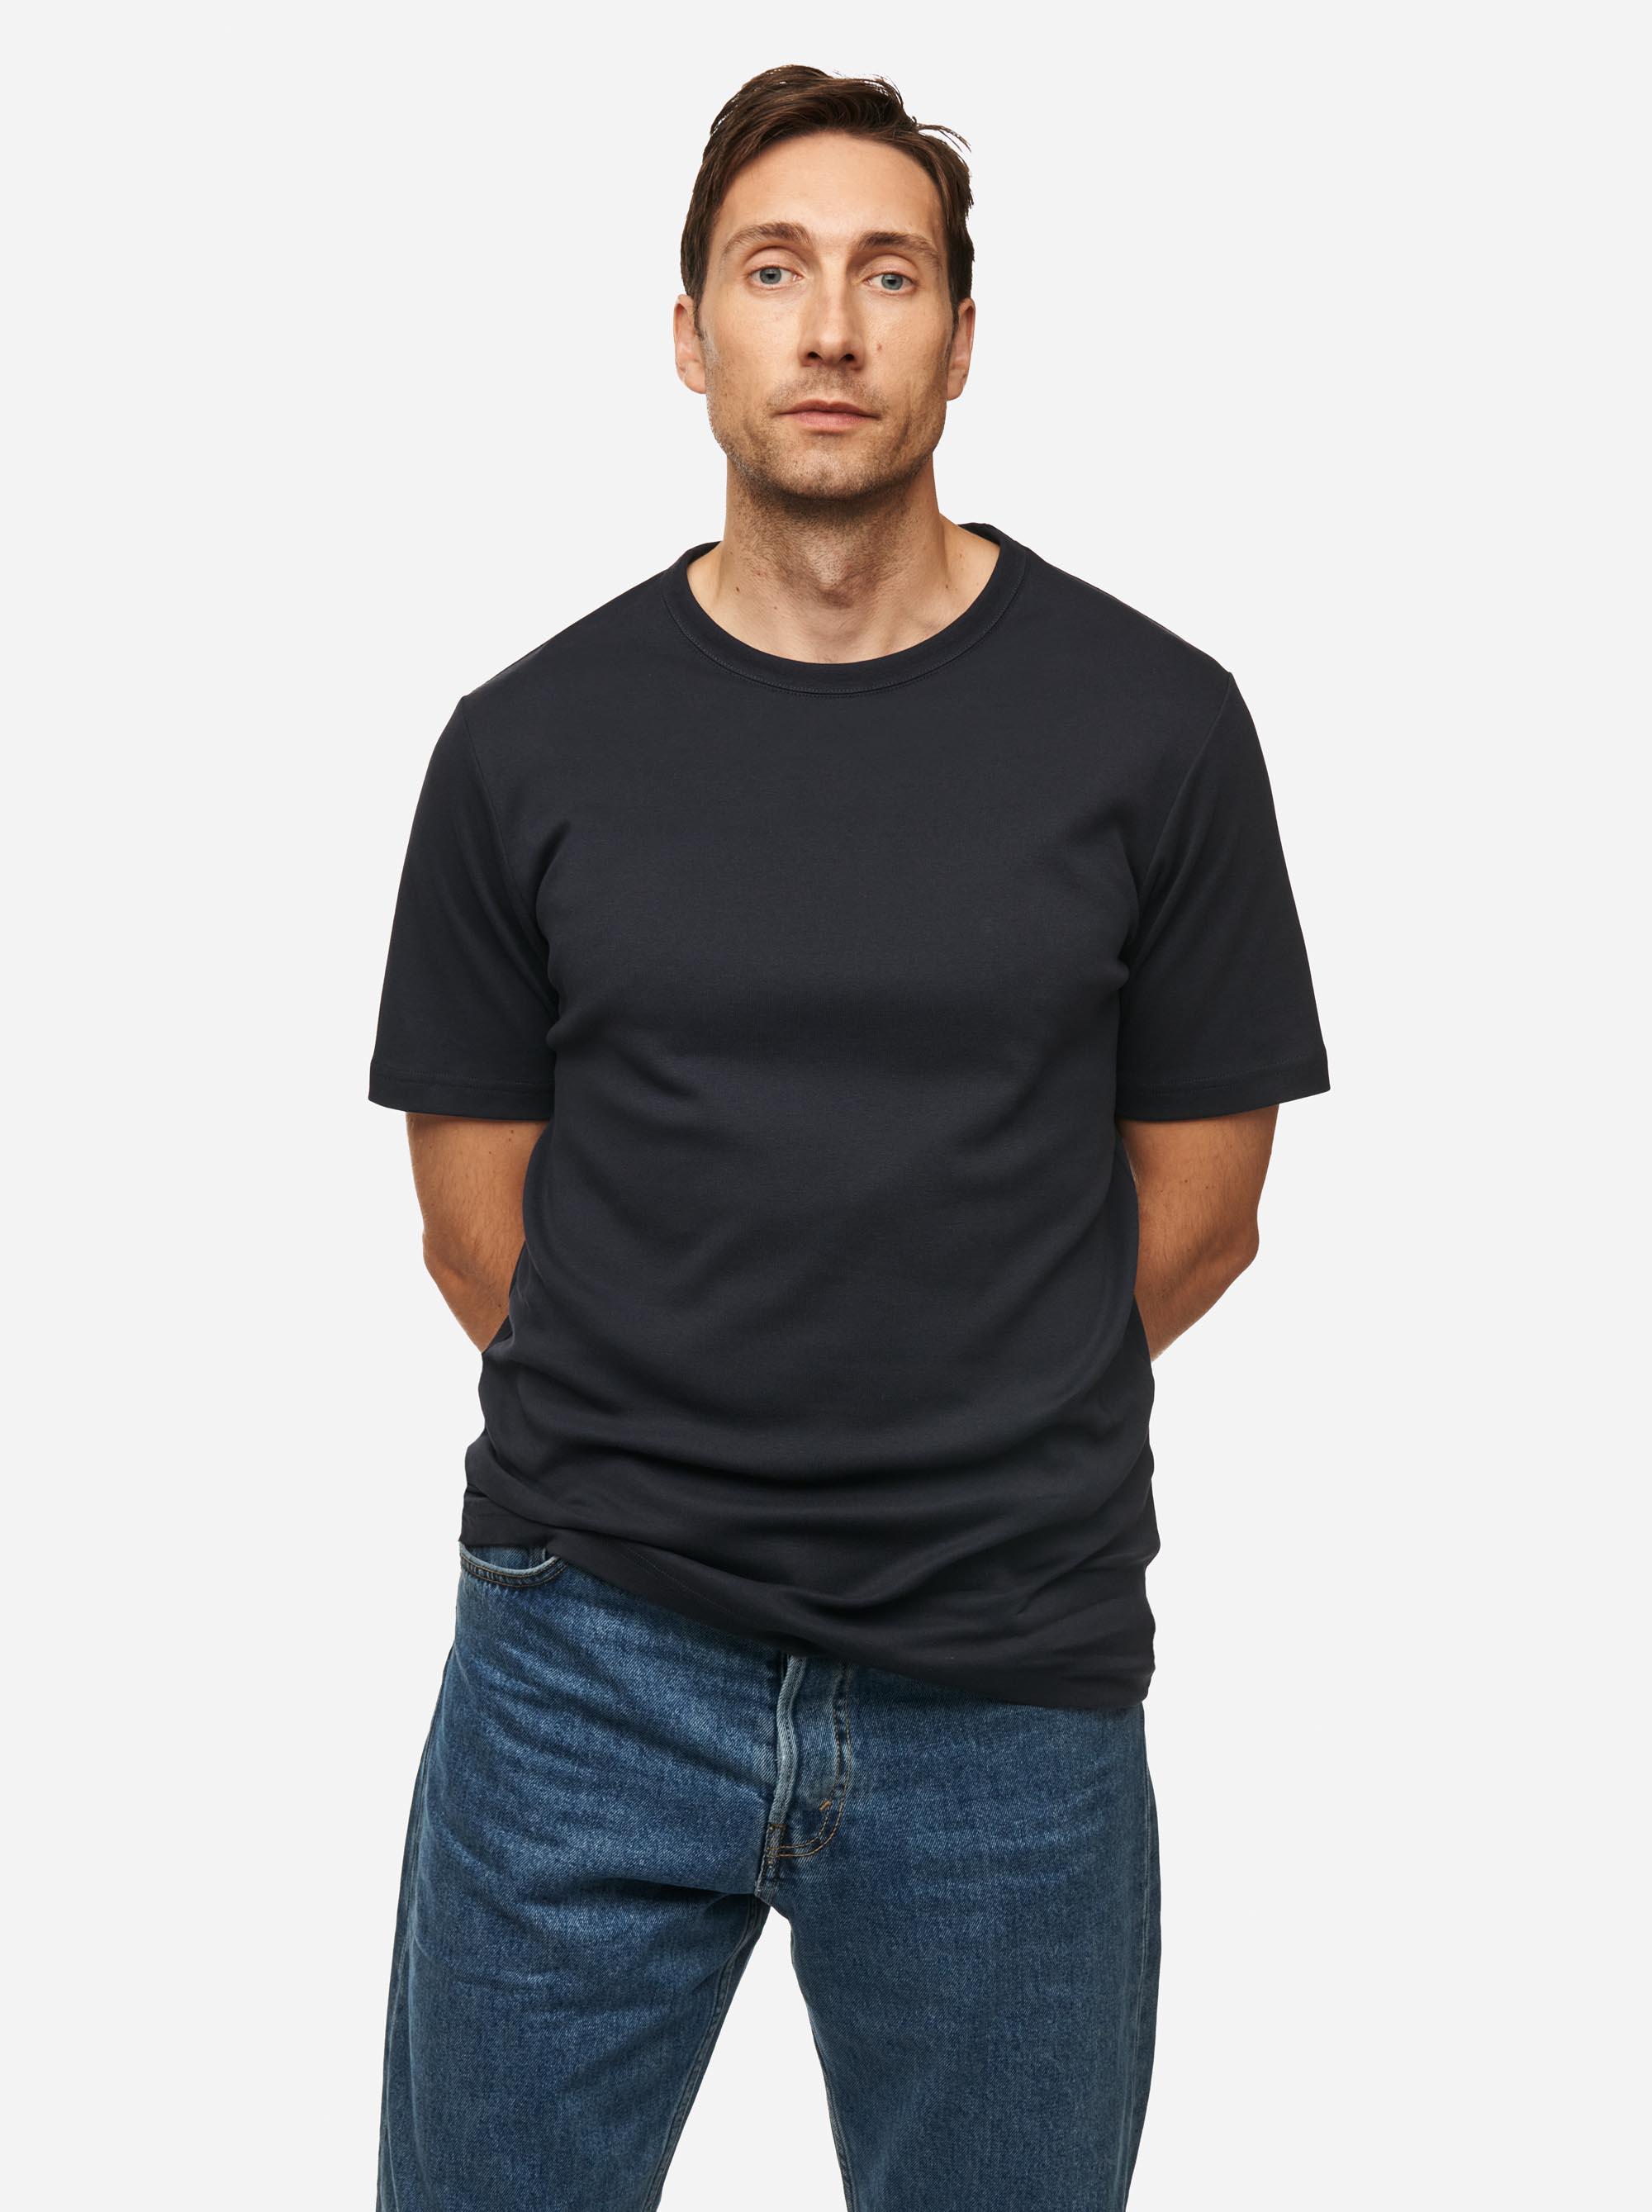 Teym - The T-Shirt - Men - Blue - 1